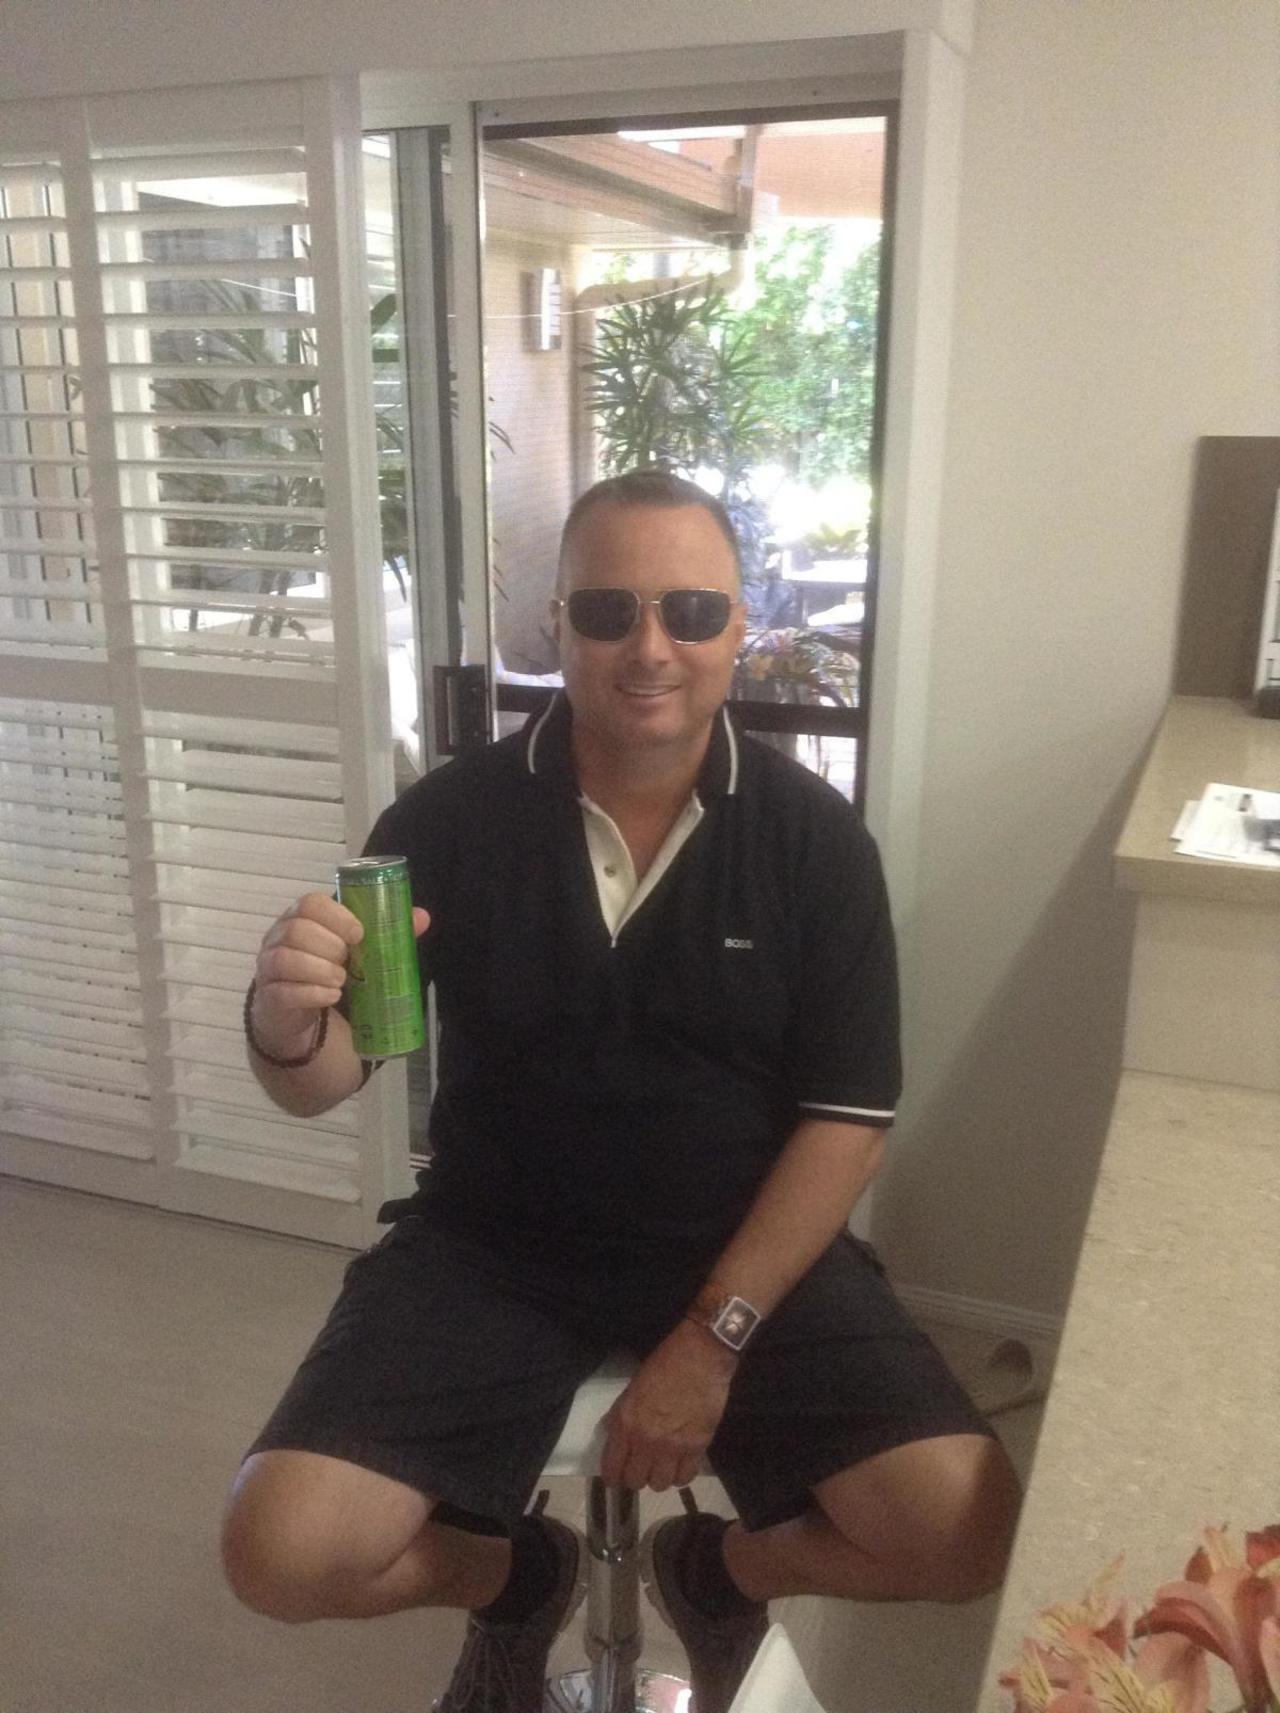 Nick from Brisbane, Australia